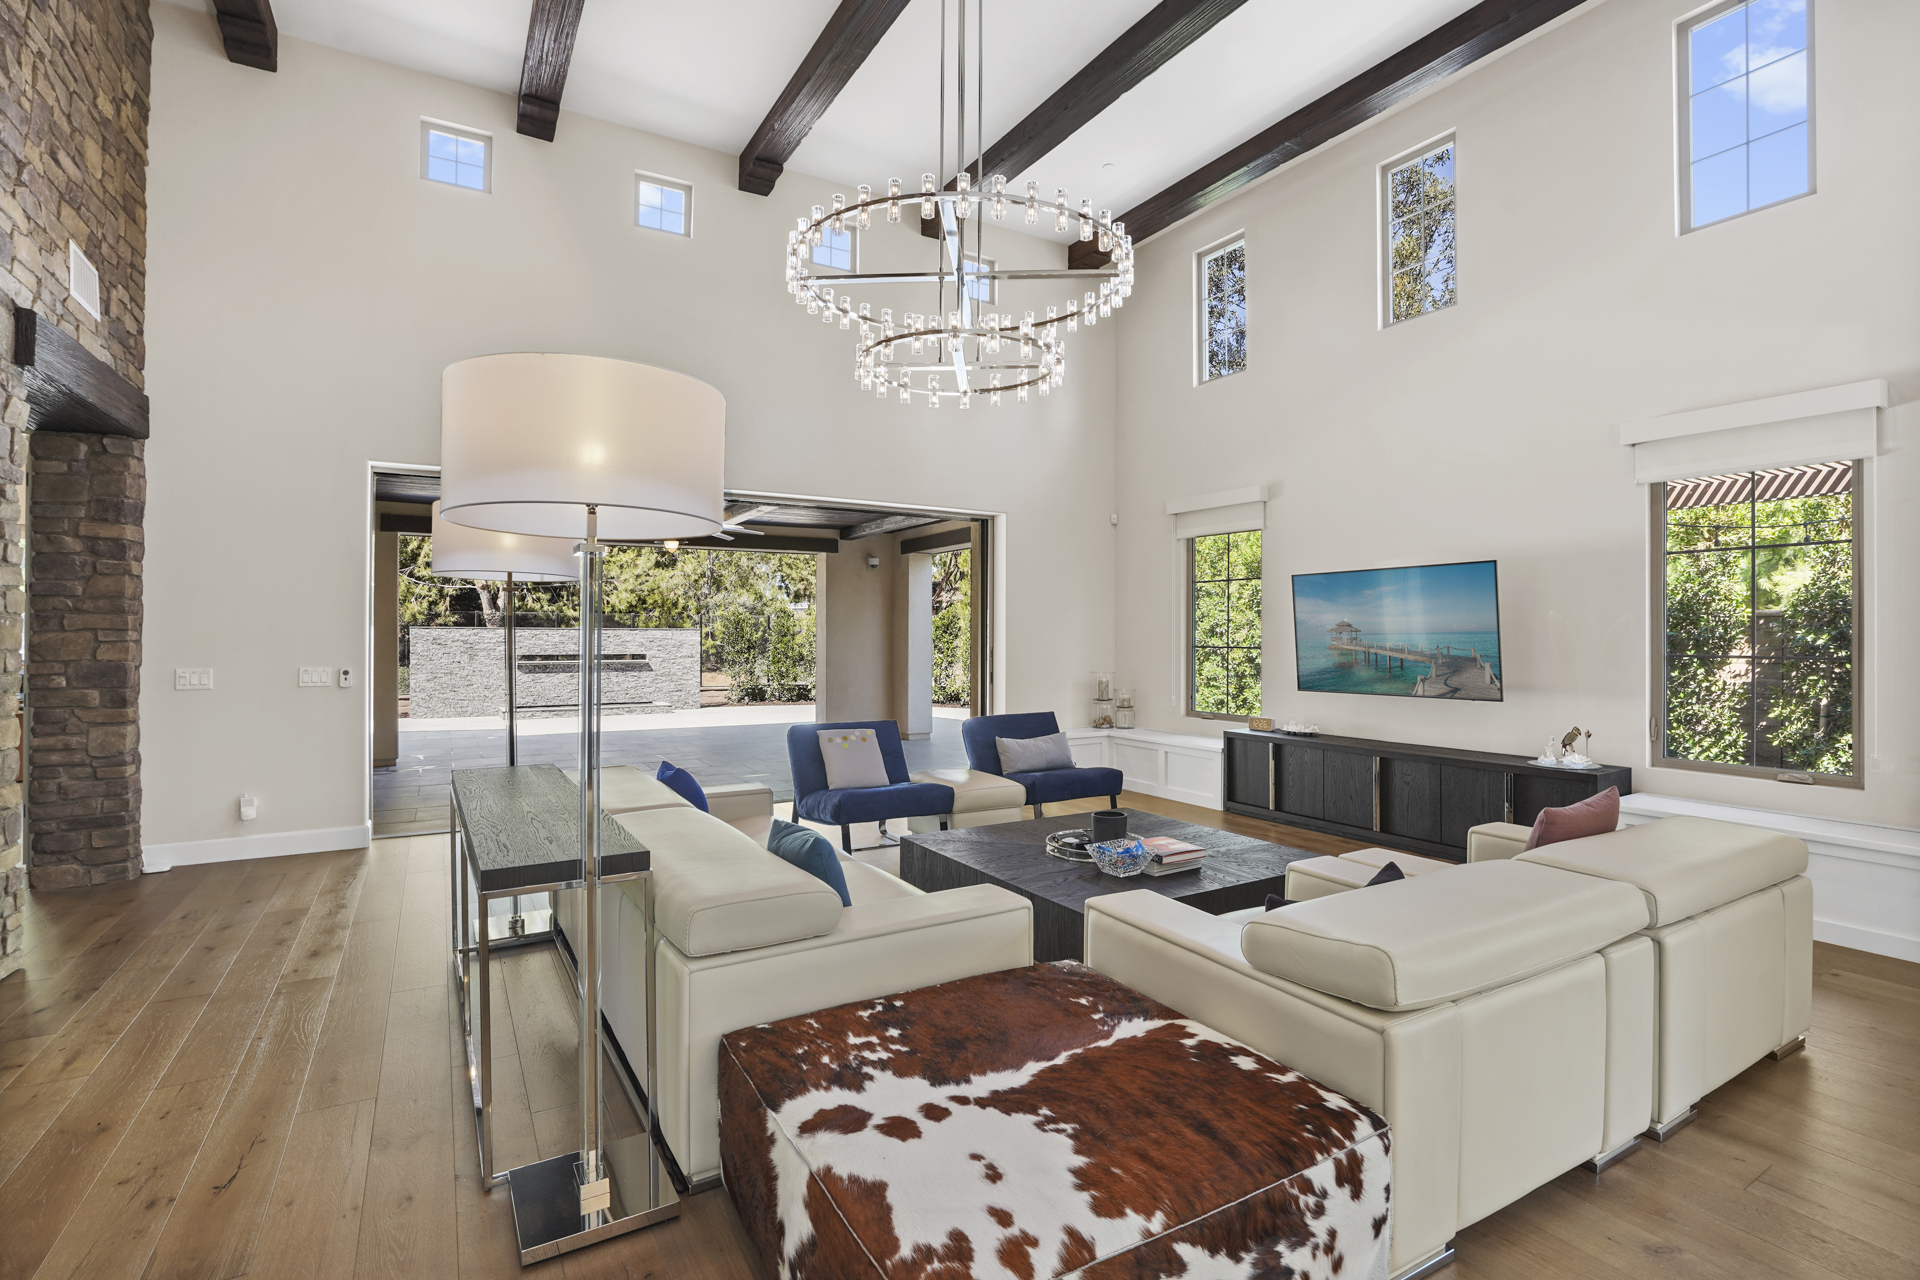 5 Sunset Cv - $2,700,000